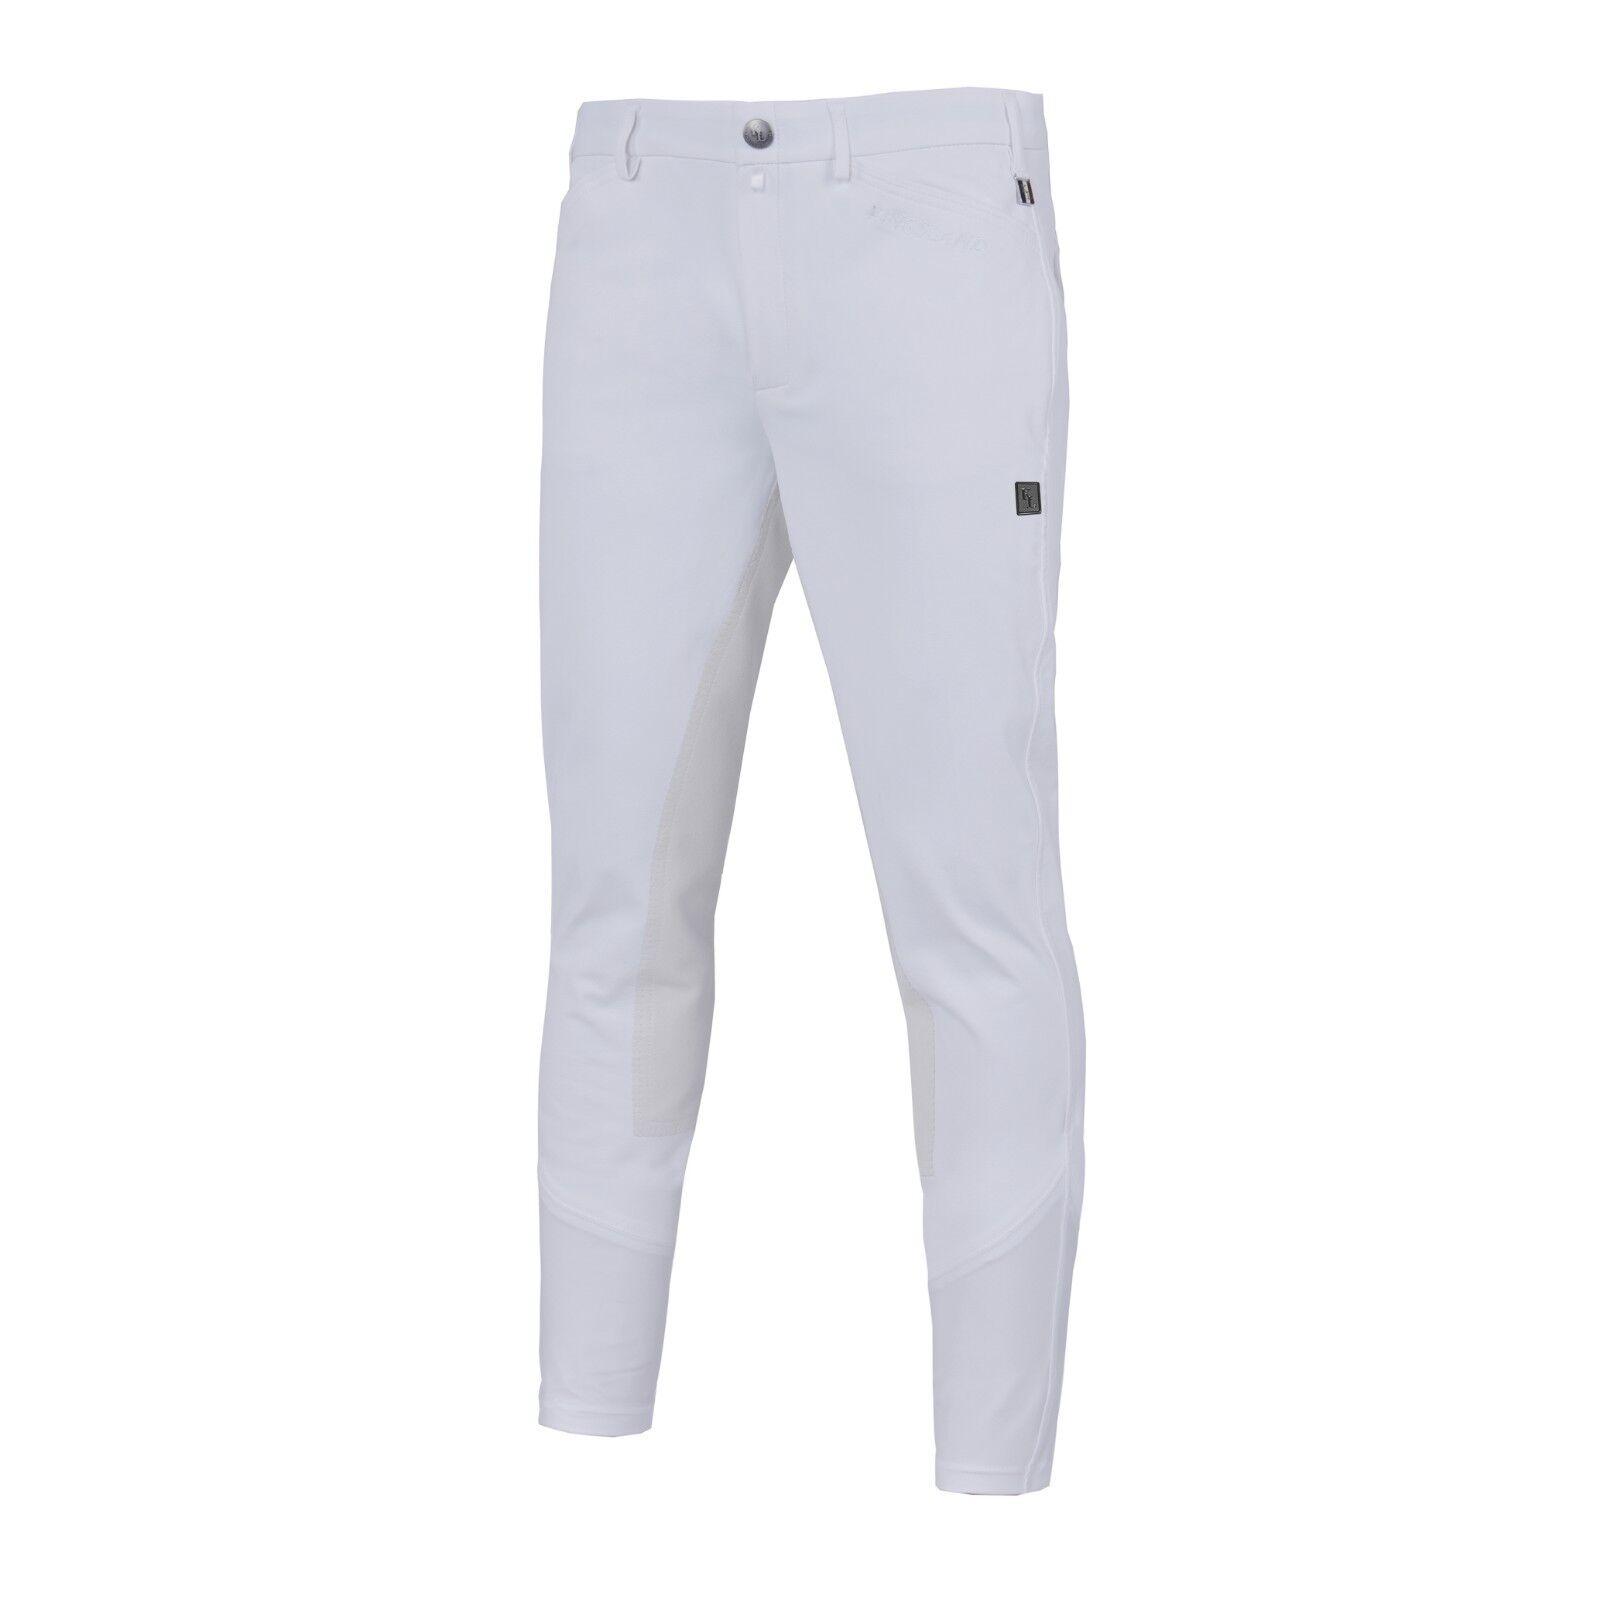 Kingsland Keith Asiento Completo Pantalones De Montar De Hombre Para Hombre  Oferta especial  RR